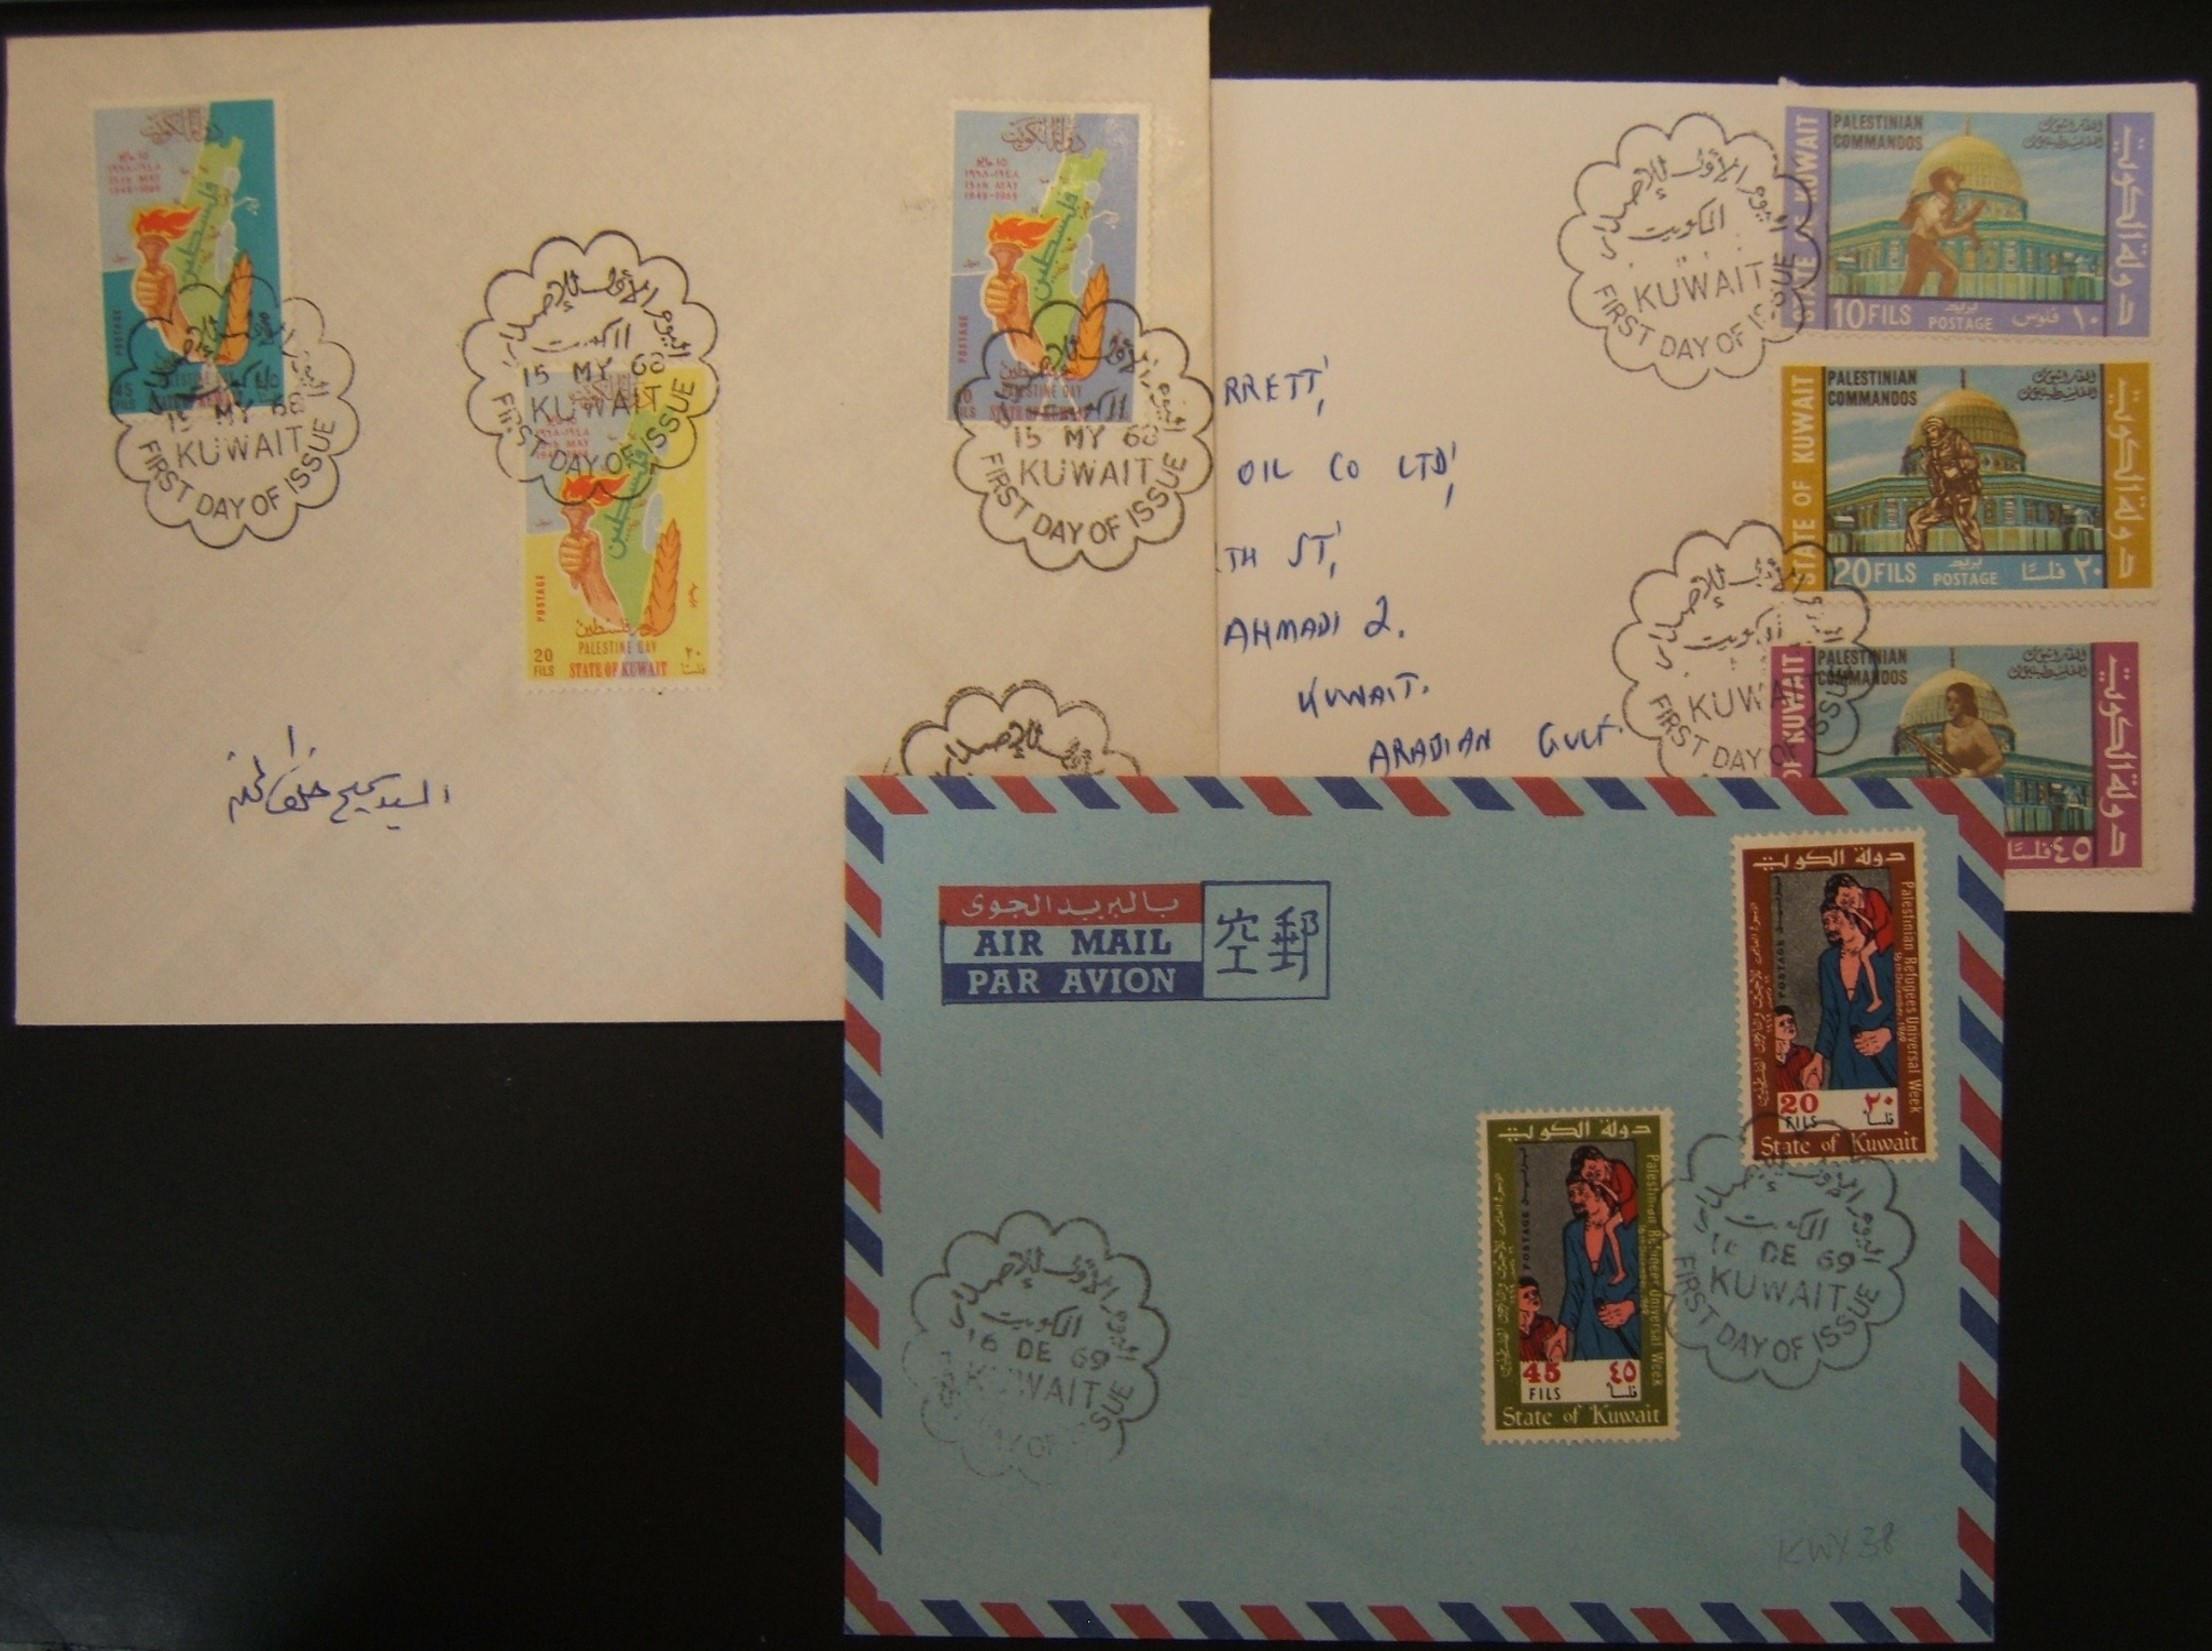 Pro-Palestinian franks on mail: lot 3x cv's ex KUWAIT bearing pro-Palestinian franks, 1) [14 MAR 71] addressed (mailed?) cv bearing 1970